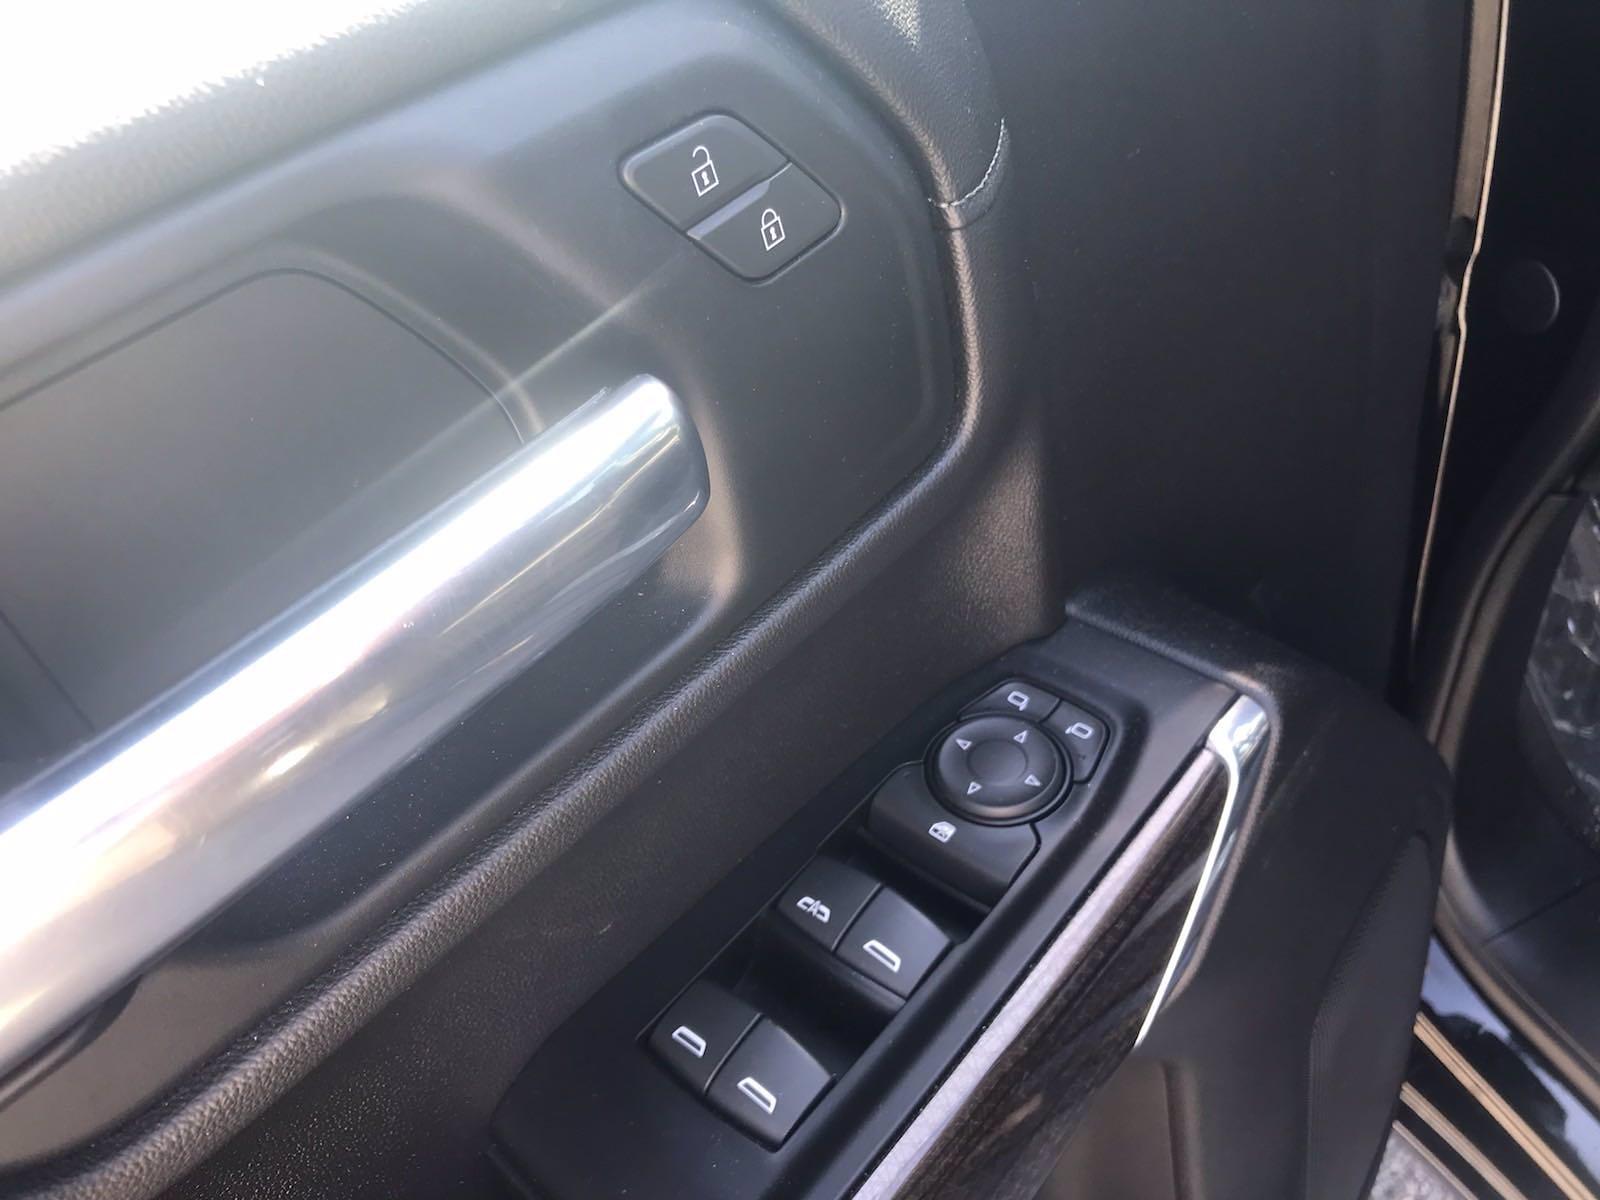 2019 Chevrolet Silverado 1500 Crew Cab 4x4, Pickup #16509P - photo 21